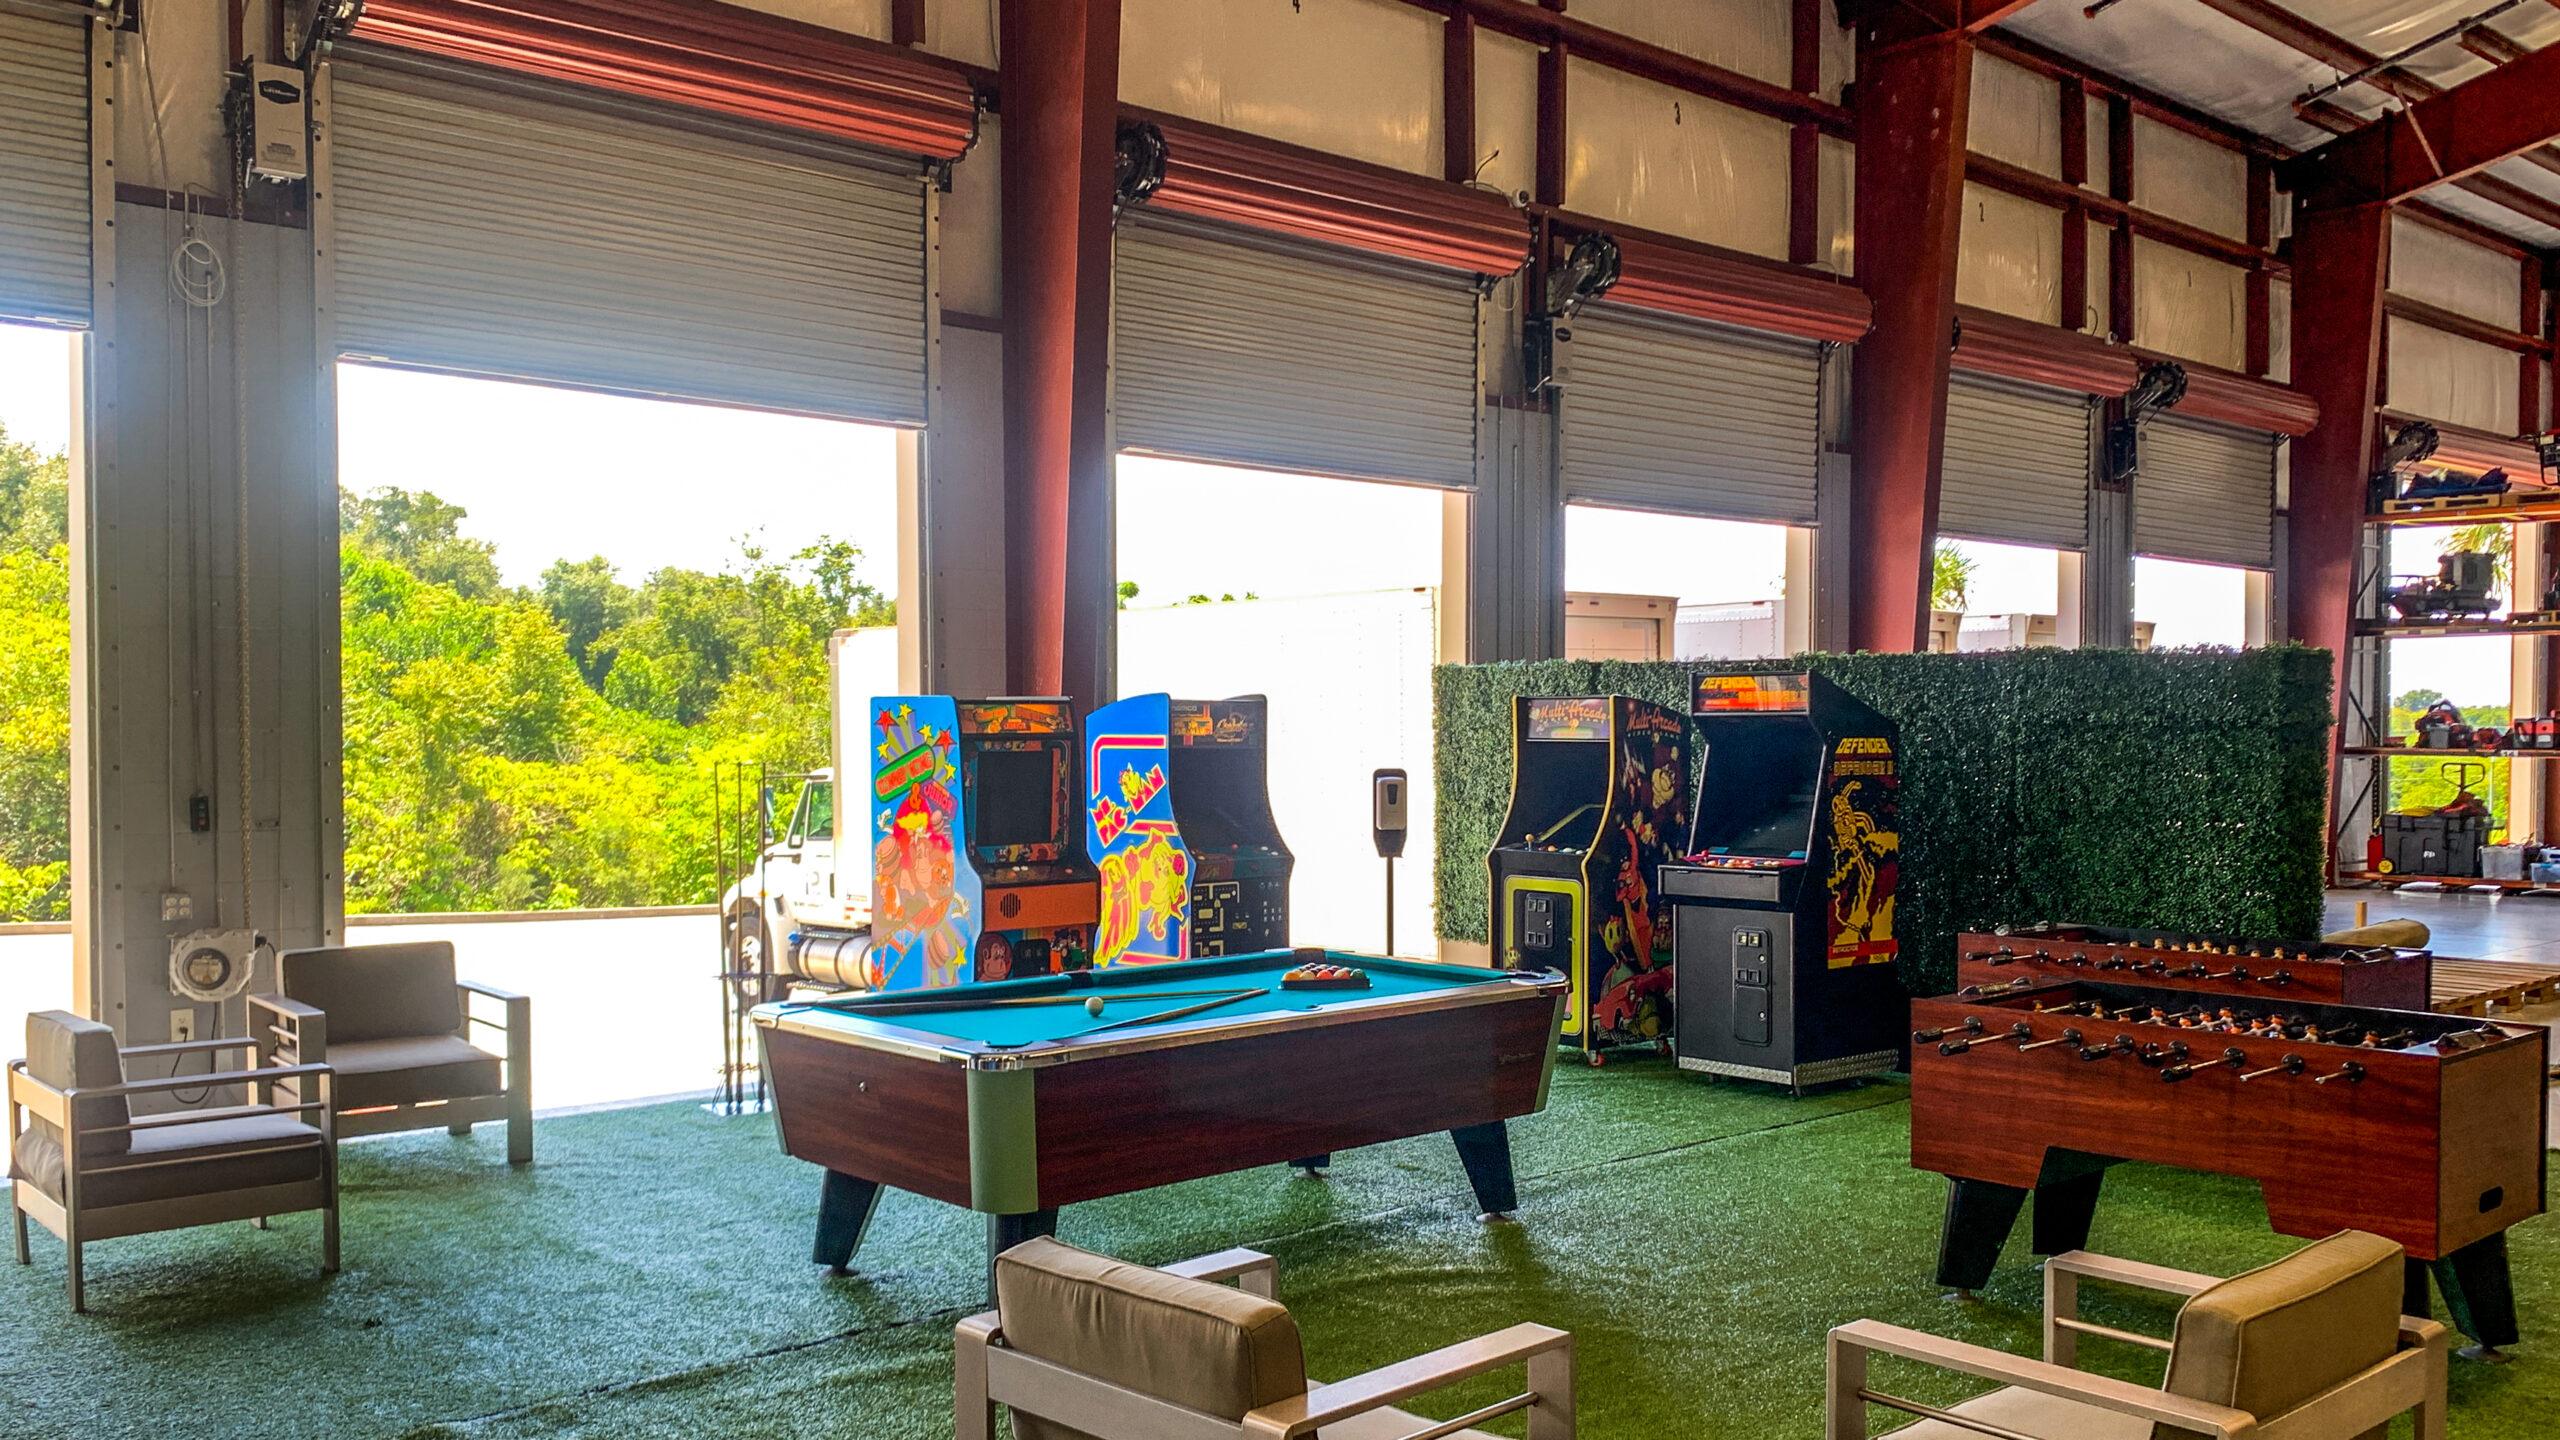 Retro Arcade Package - Small